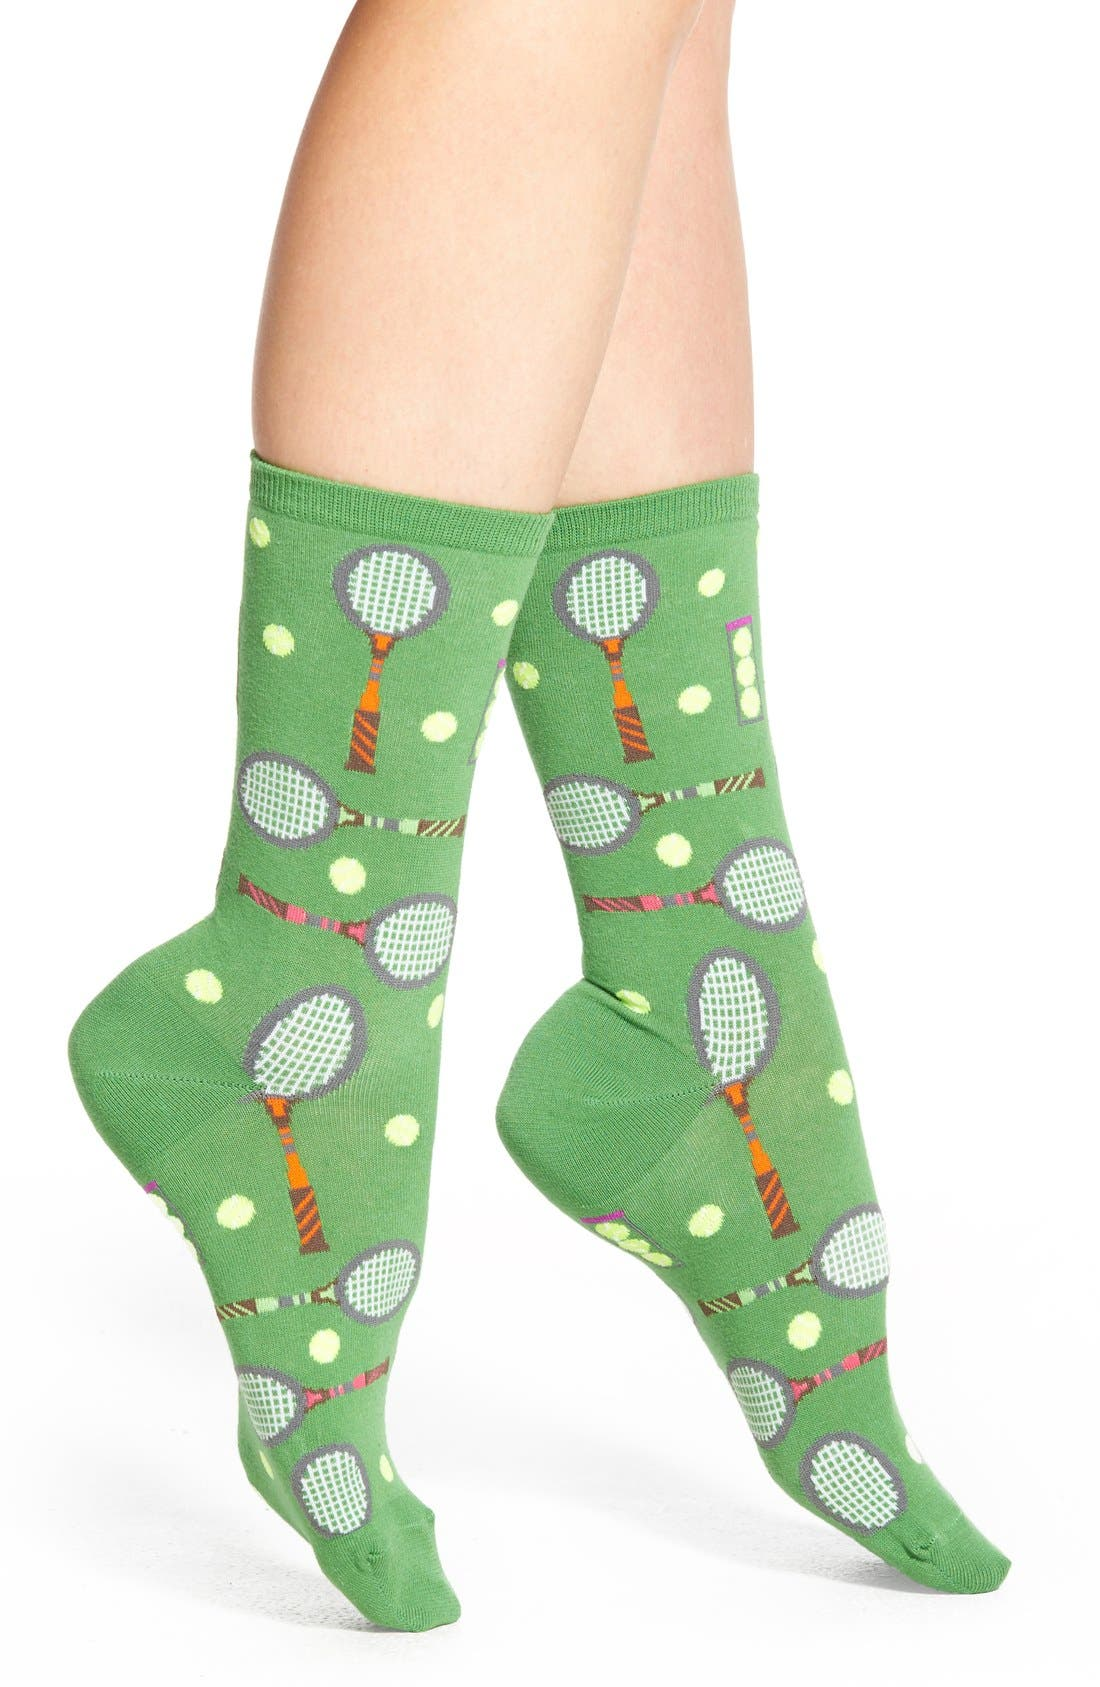 HOT SOX 'Tennis' Crew Socks, Main, color, 323